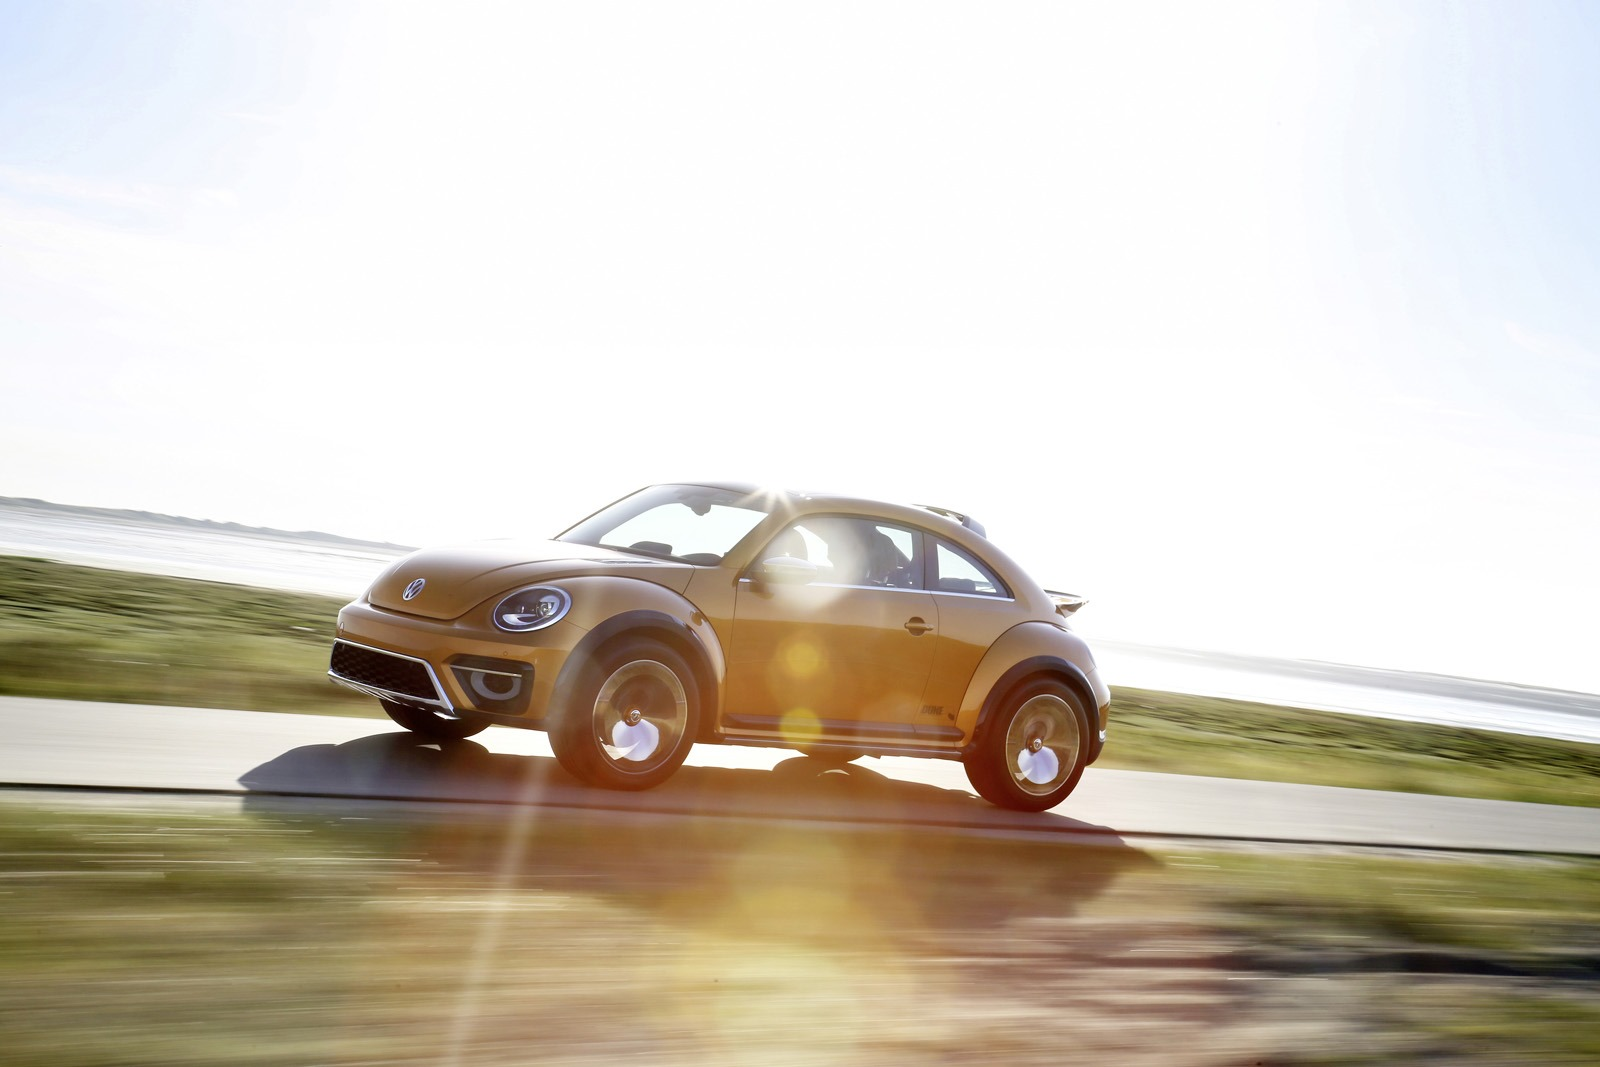 Новый концепт Volkswagen Beetle Dune 2014 года